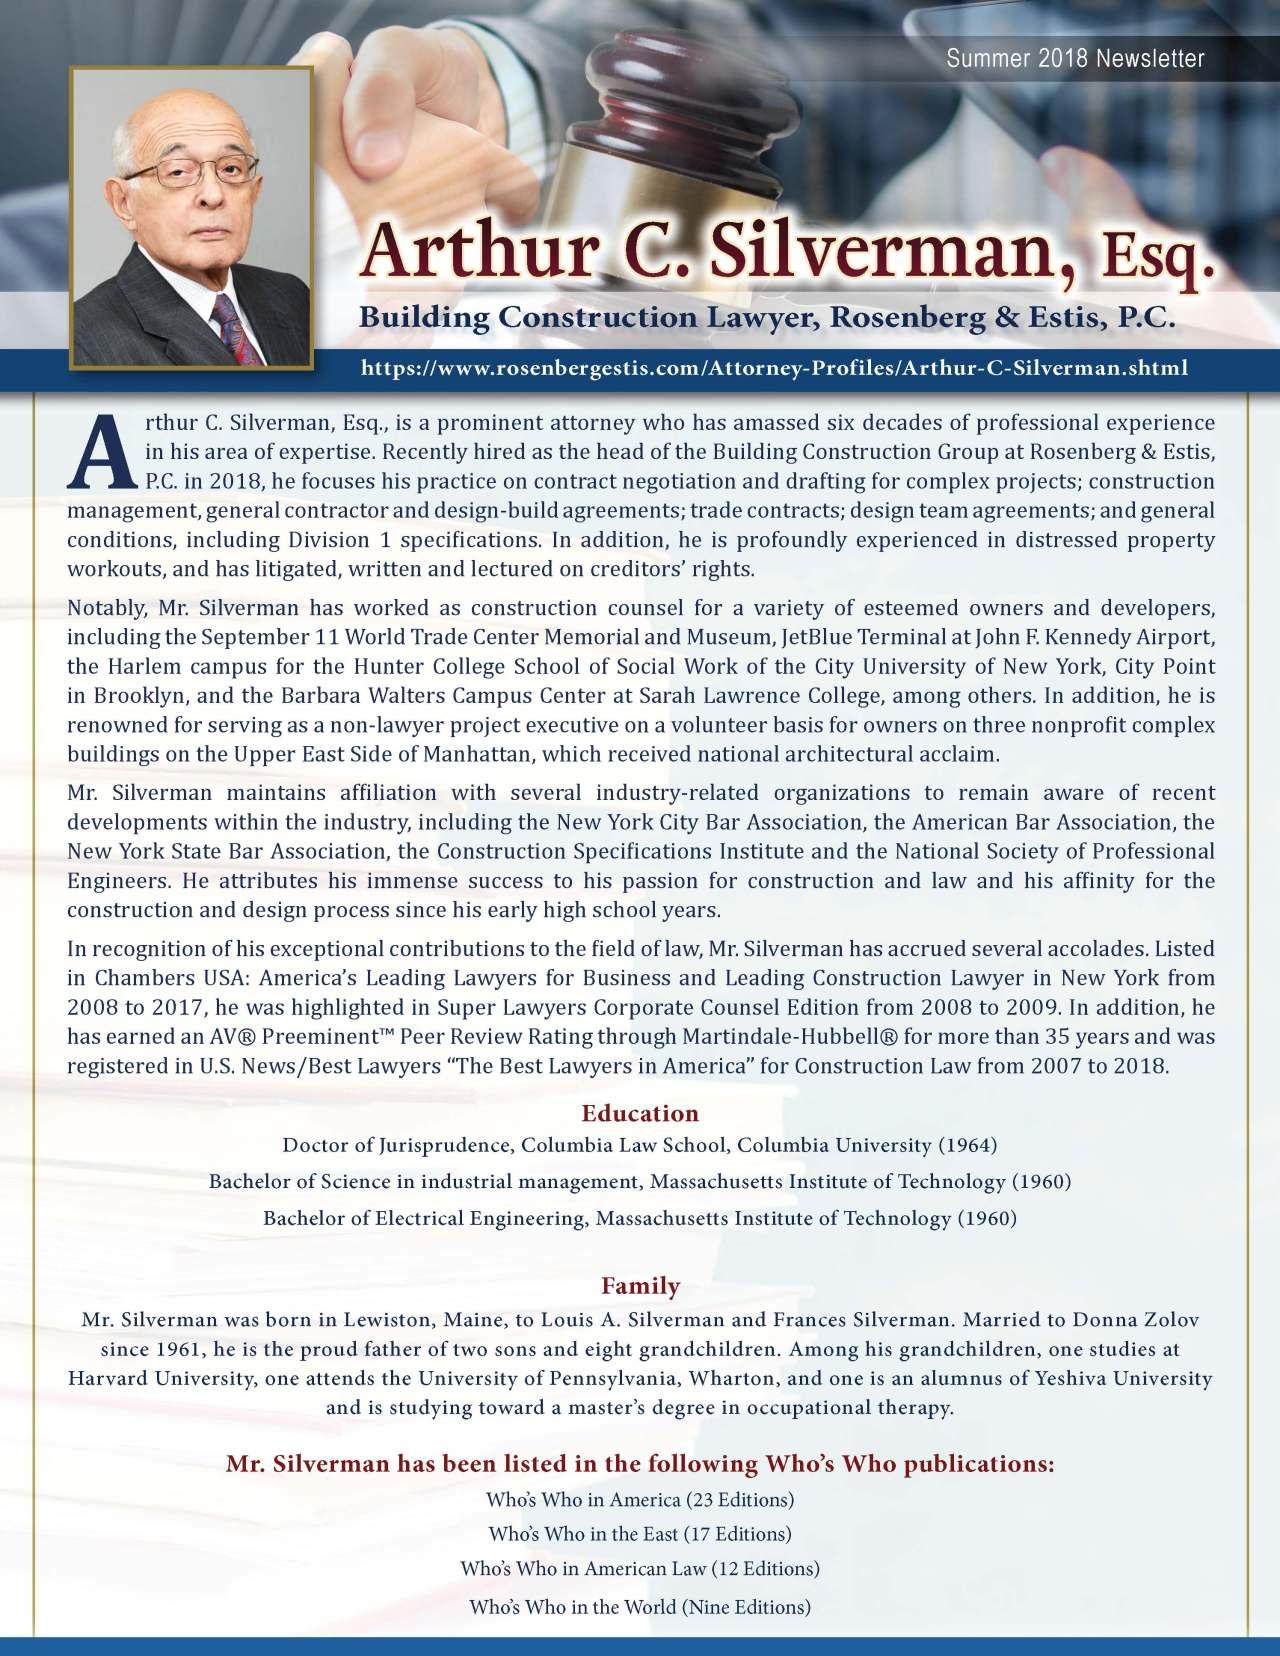 Arthur C. Silverman